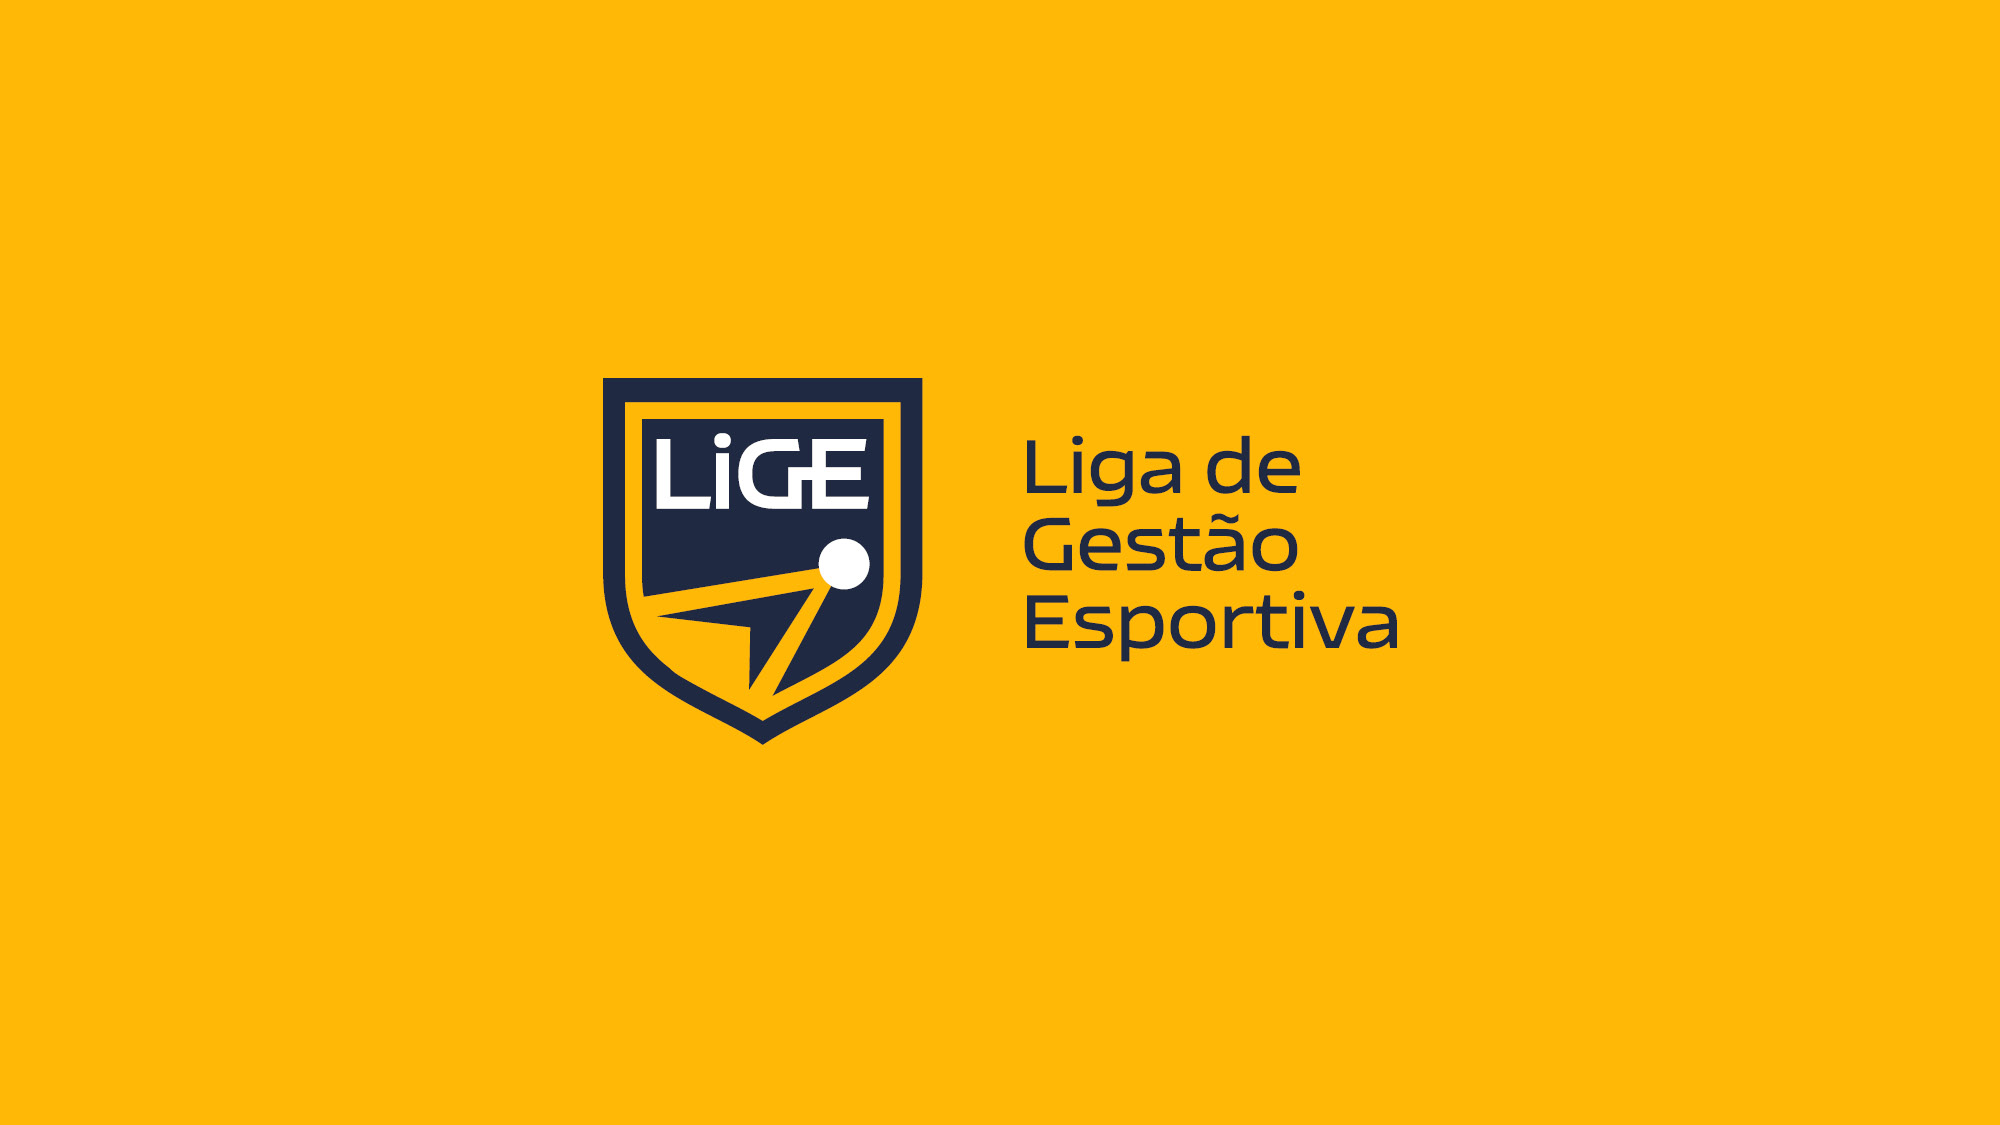 Lige-FGV-SP-Nacione-Branding14